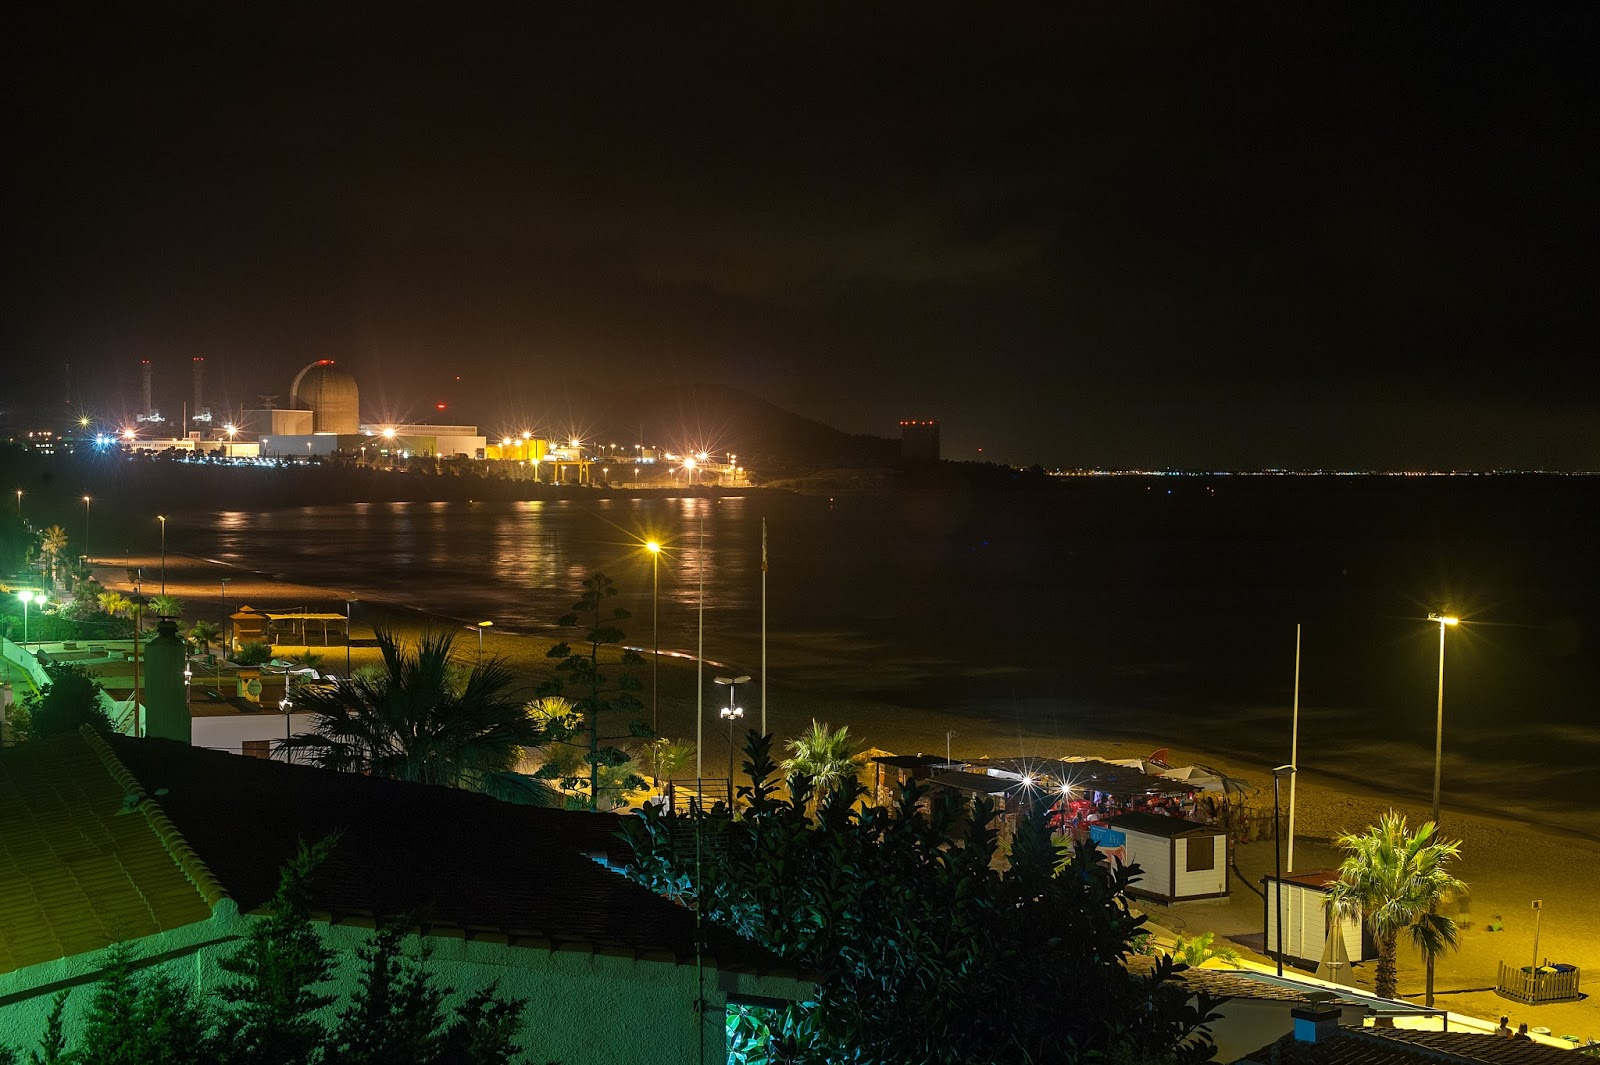 Playa L'Almadrava / L'Arenalet